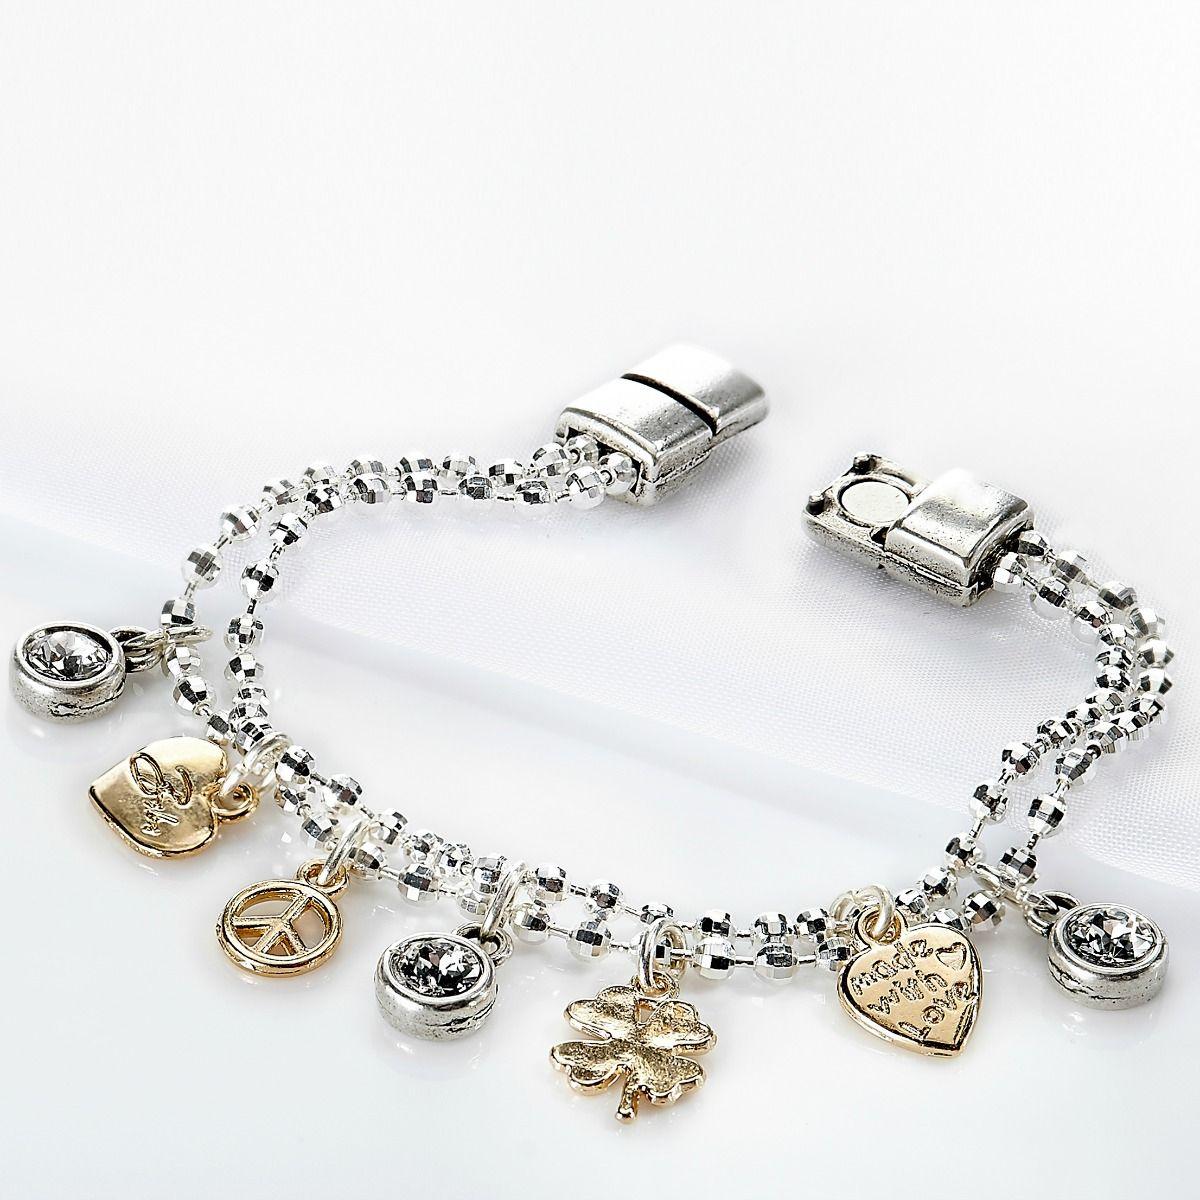 Magnetic Charm Bracelet: Bibi Bijoux Sparkle Charm Bracelet W/ Magnetic Clasp